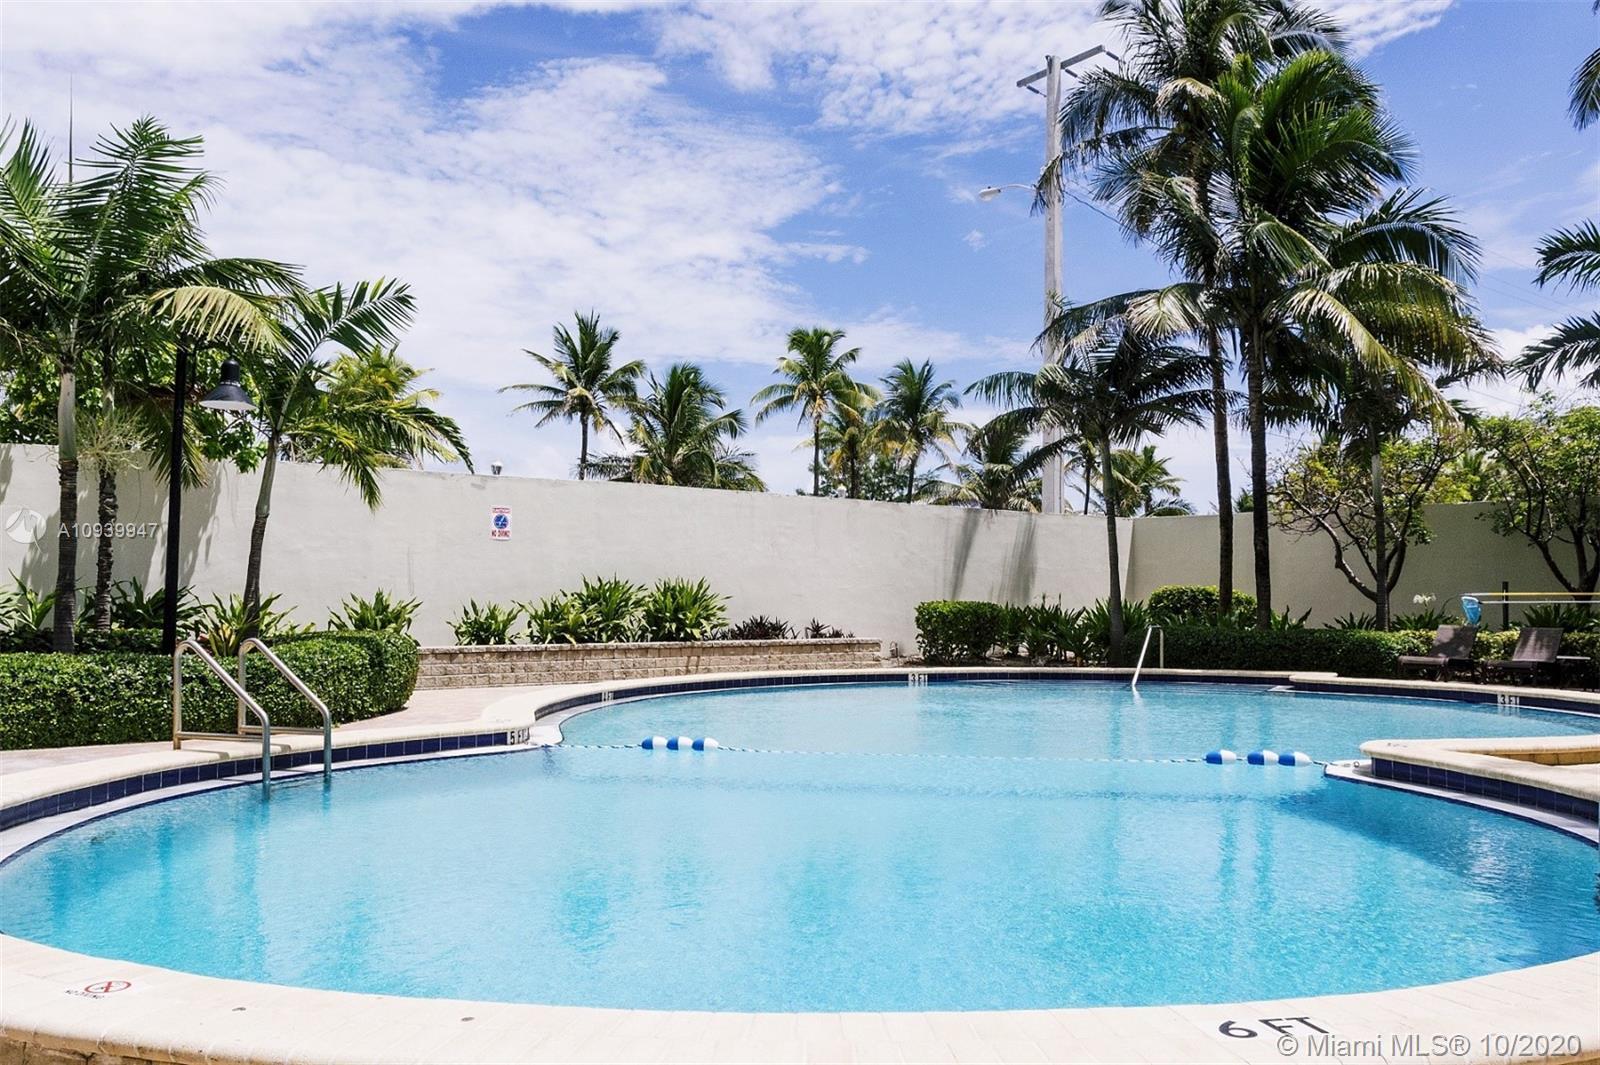 Ocean Reserve #1404 + DEN - 19370 Collins Ave #1404 + DEN, Sunny Isles Beach, FL 33160